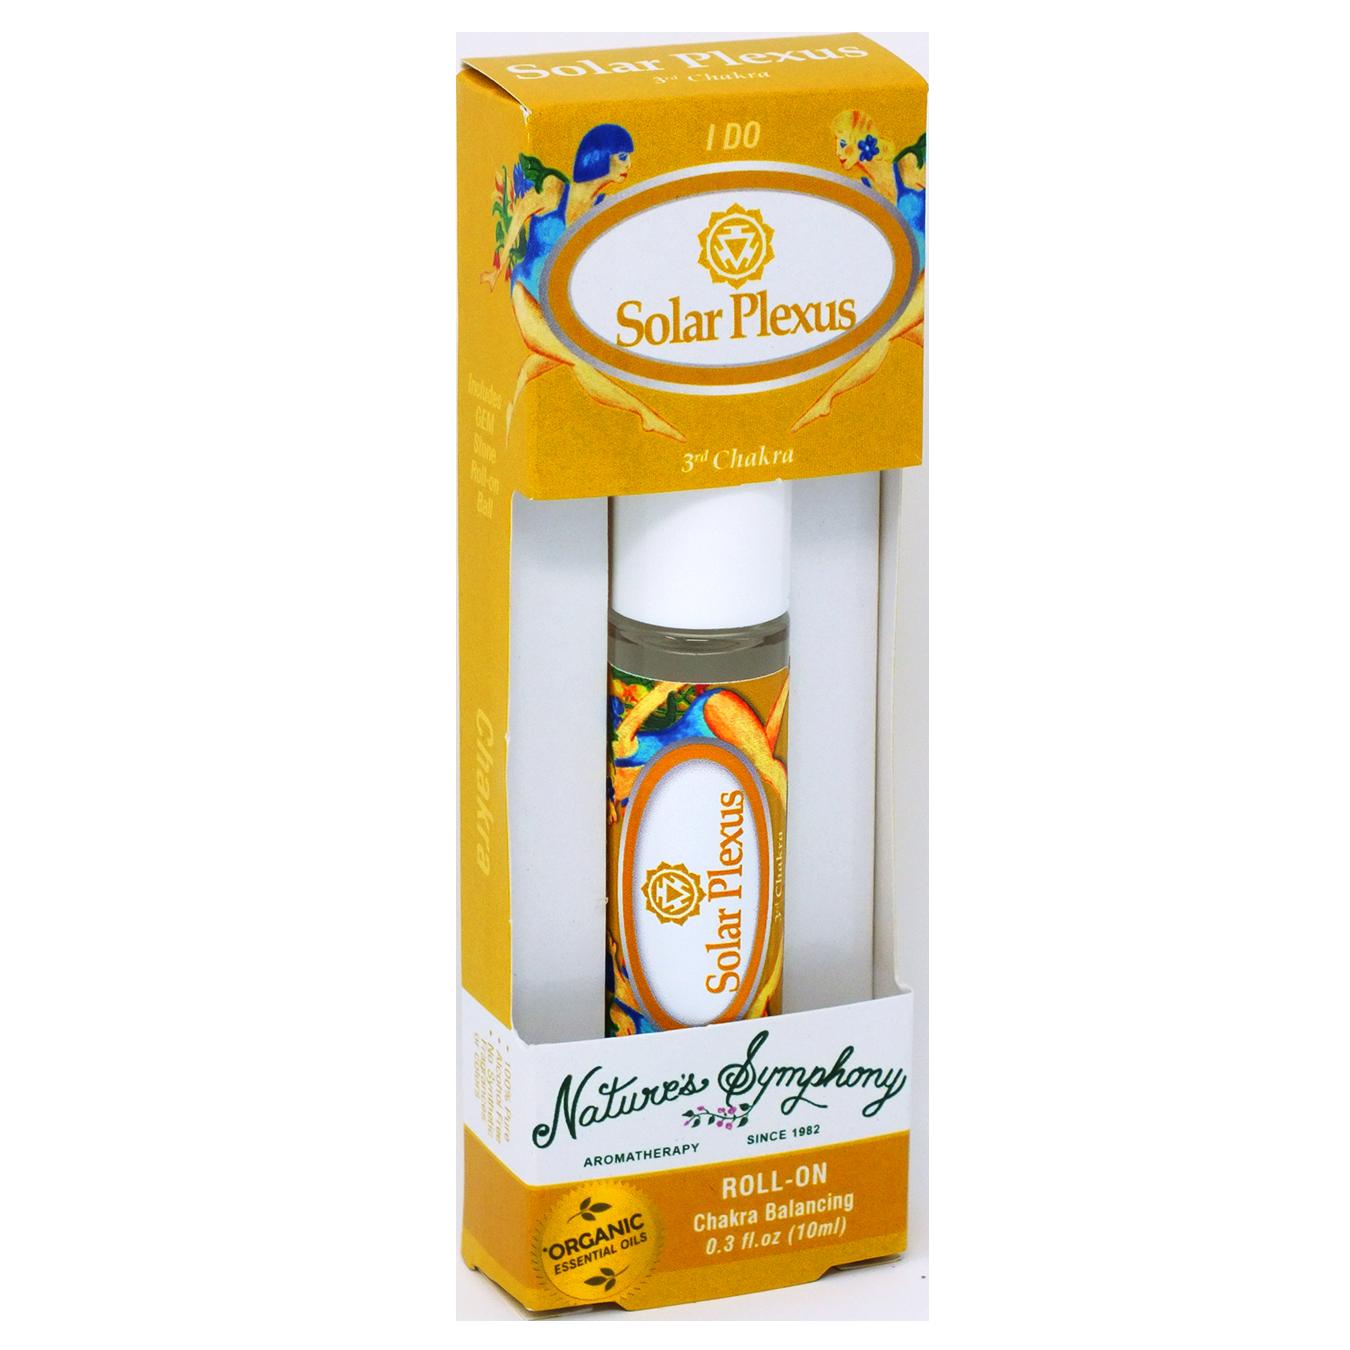 3rd Chakra | Solar Plexus, Roller Ball, Chakra Blend Organic/Wildcraft - 10ml